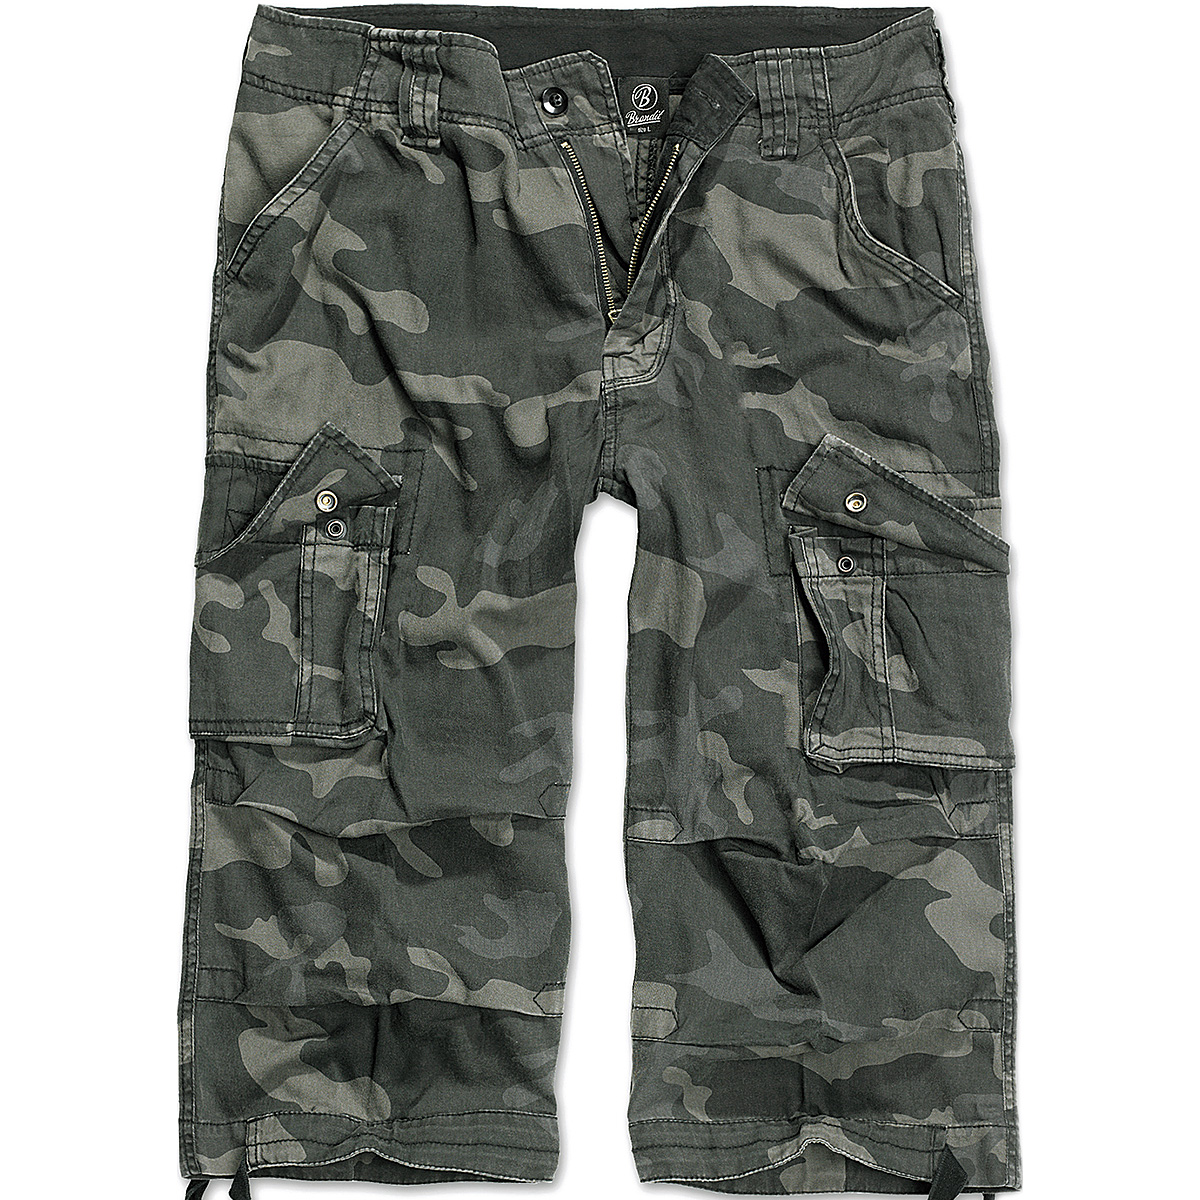 Brandit Urban Legend 3/4 Shorts Mens Paintball Pants Airsoft Cargos Dark Camo